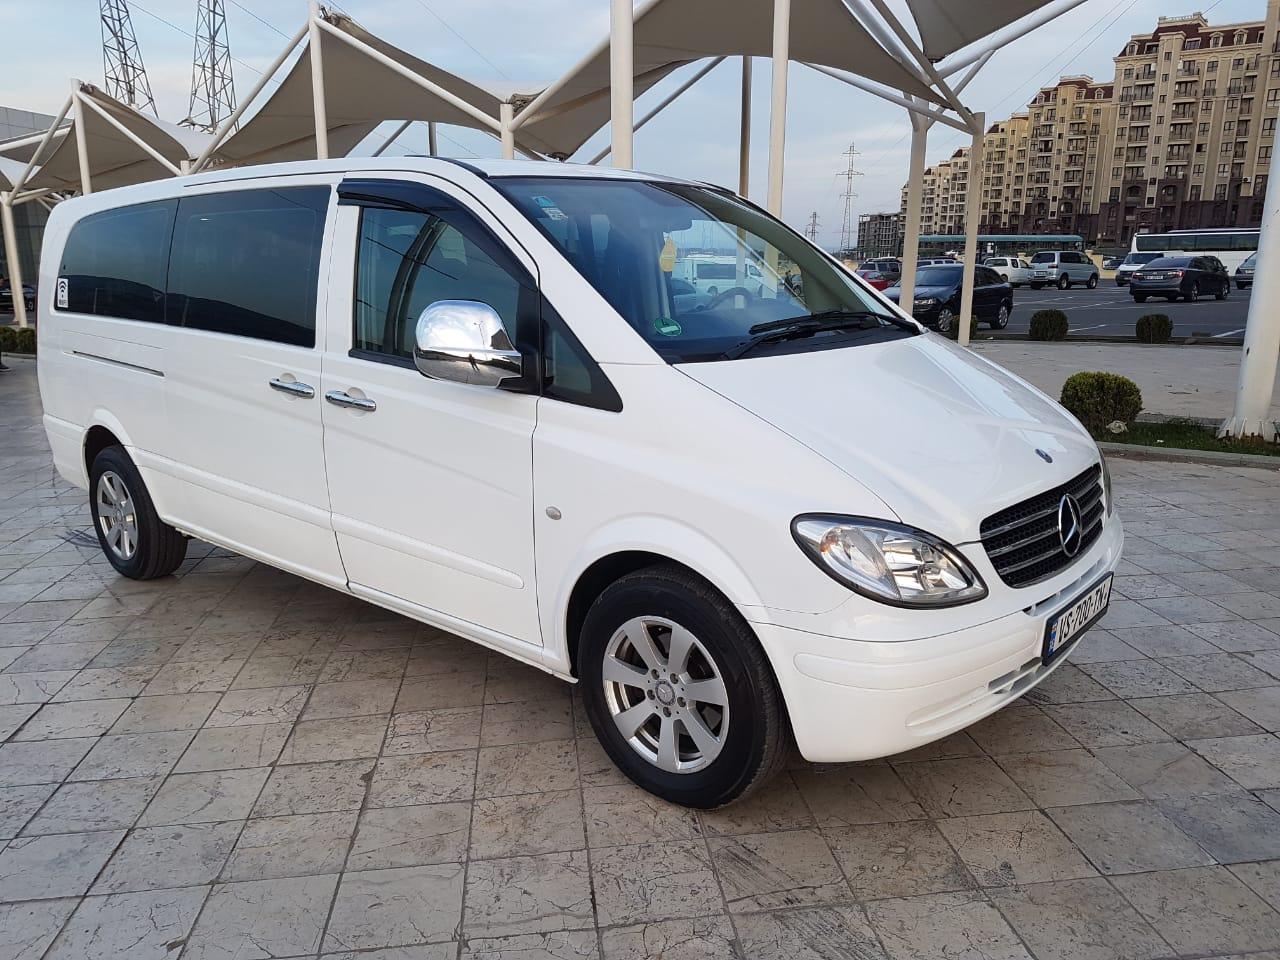 Mercedes Vito for Rent